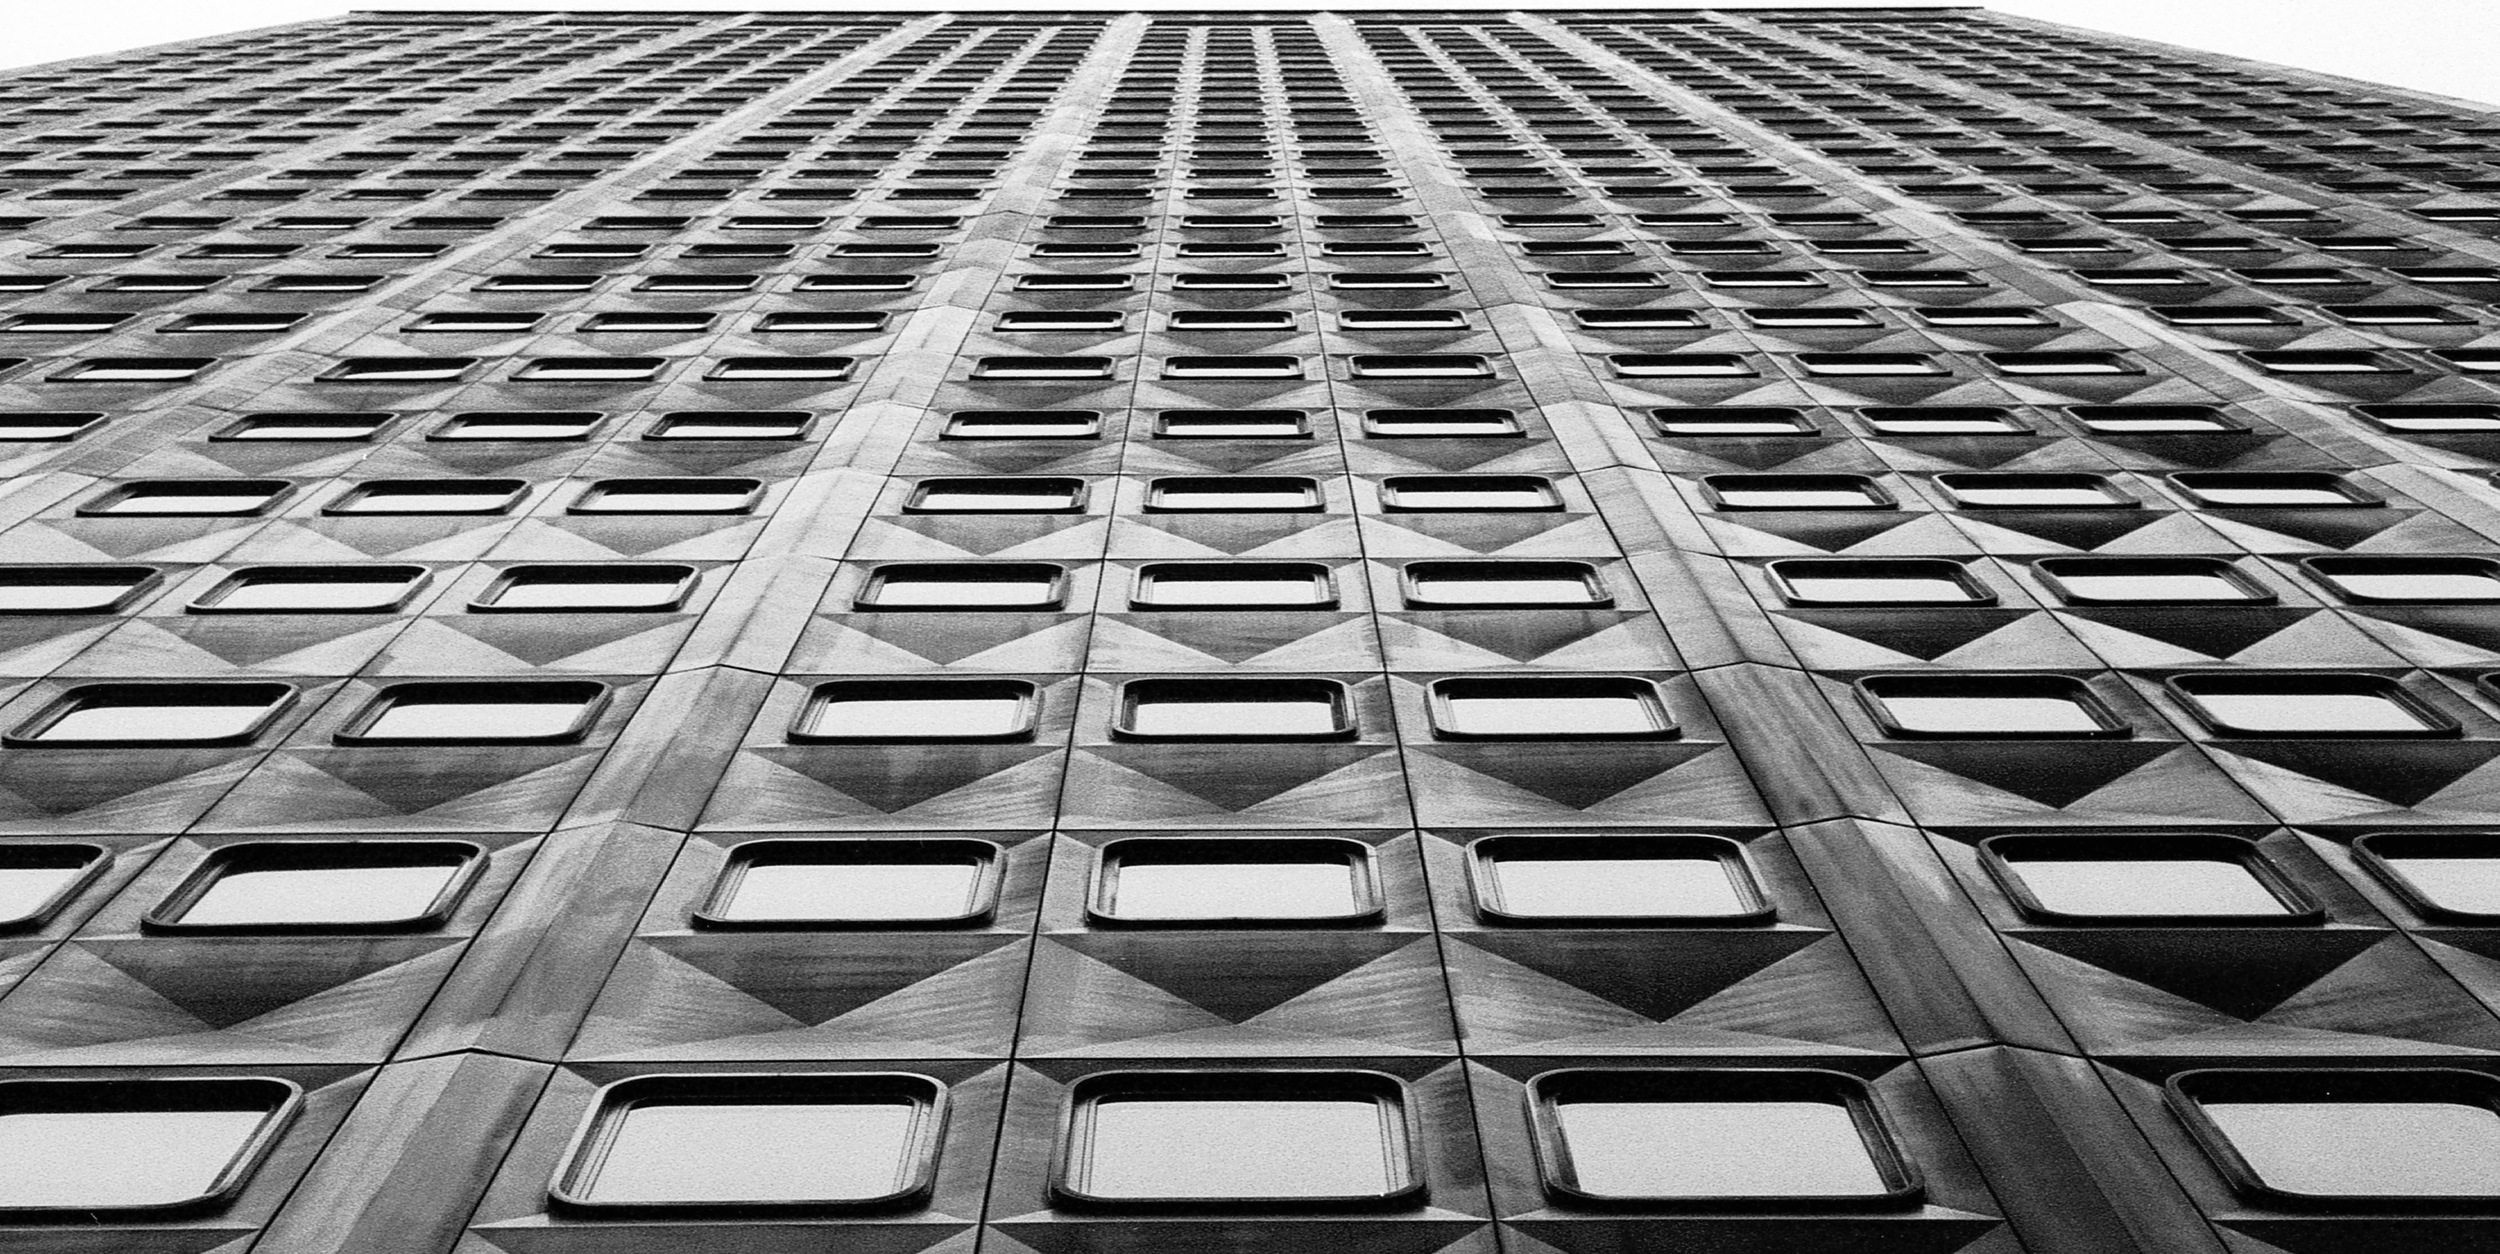 Urban checkers -Pittsburgh (Alcoa Building) | Tri-X 400 @ 1600